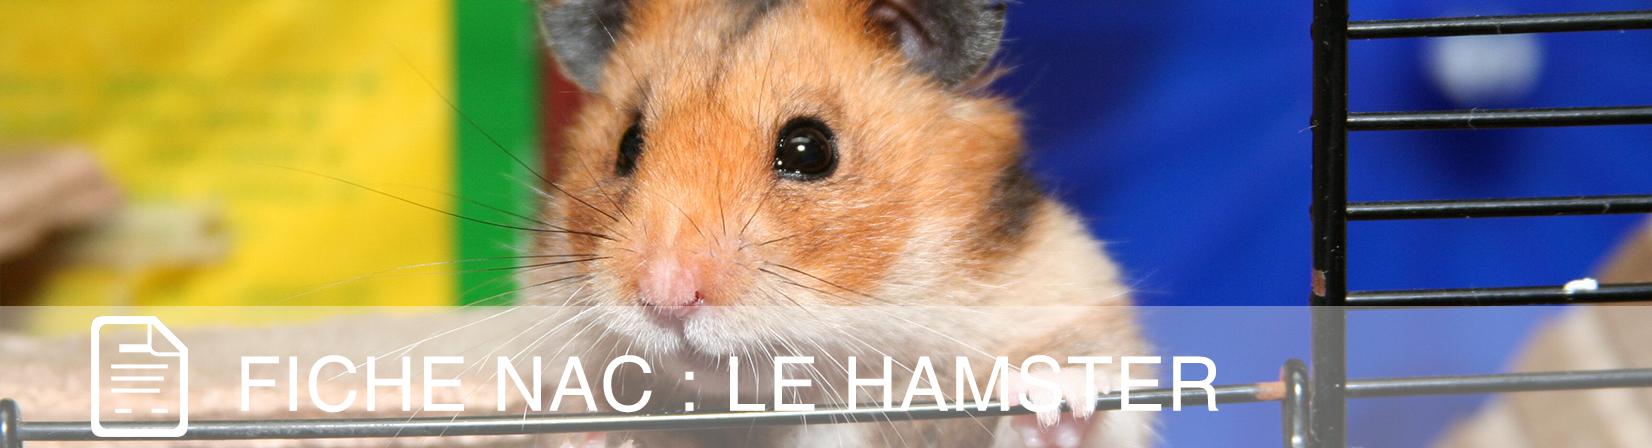 fiche-nac-hamster